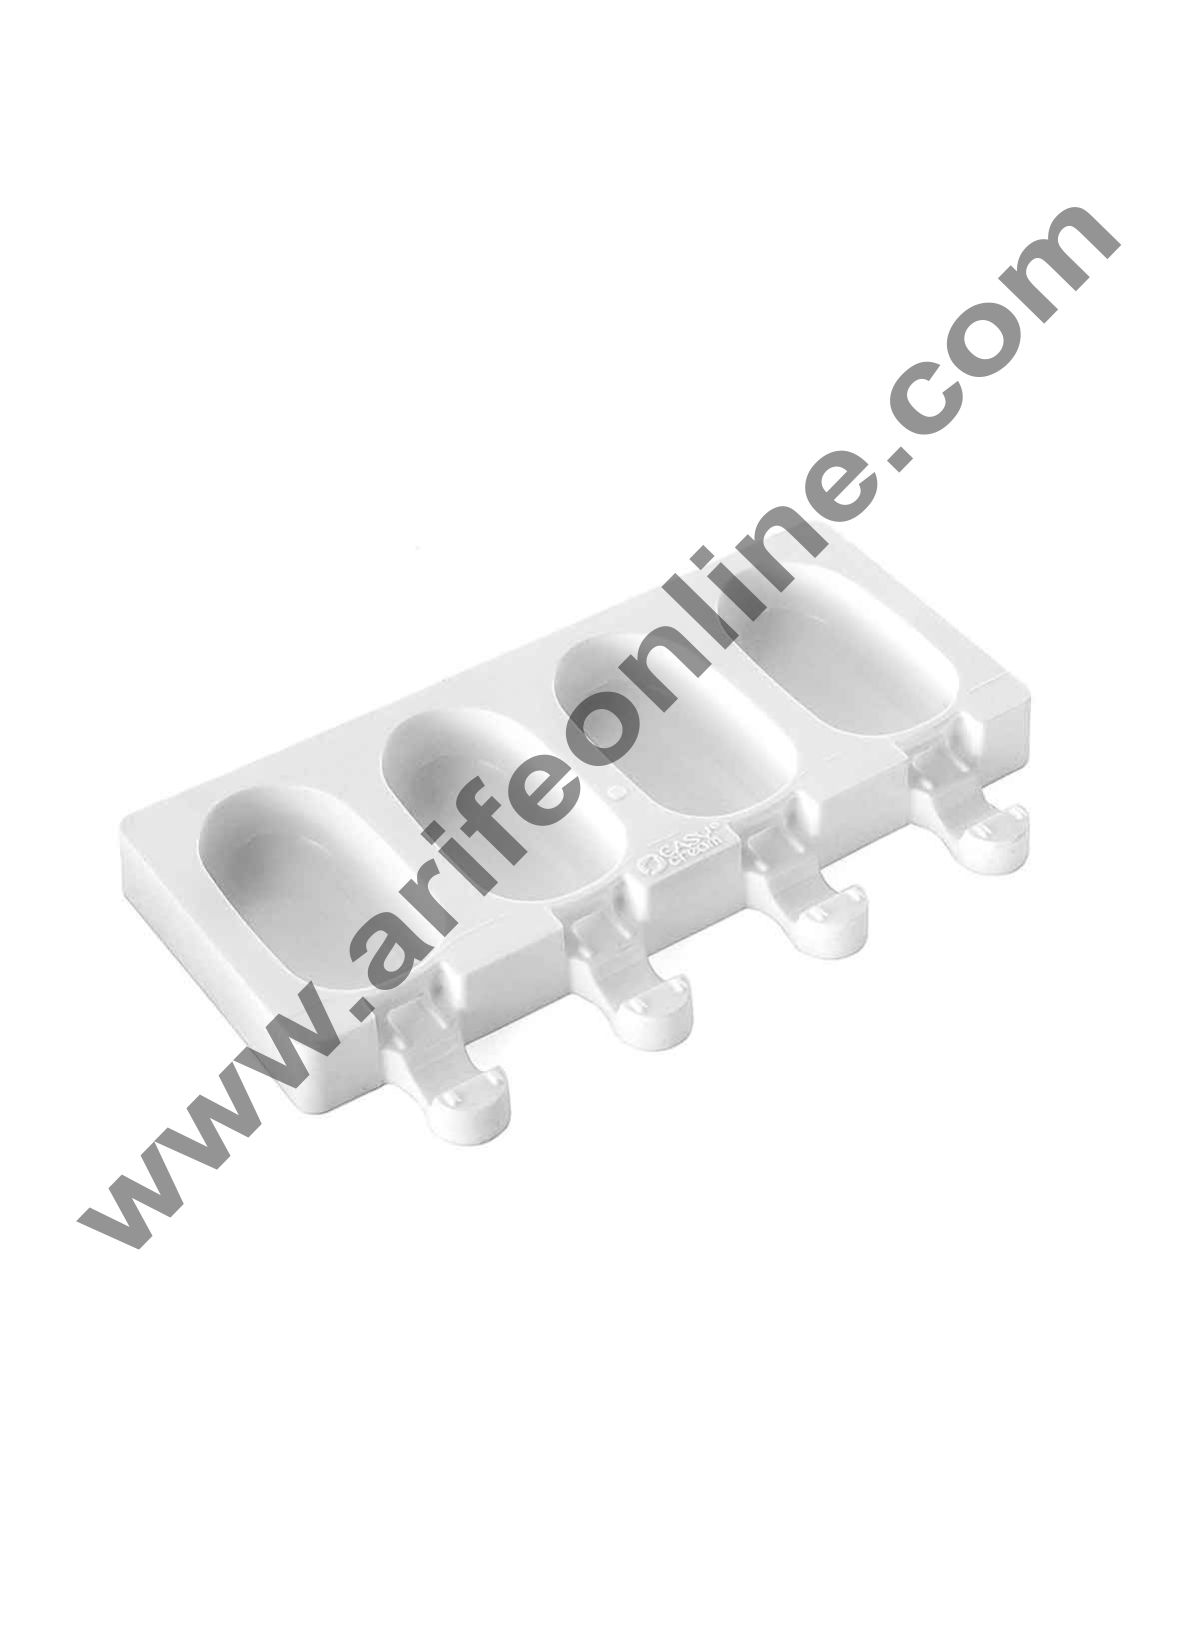 Cake Decor 4Pcs White Classic Silicone Cakesicle Mold Popsicle Easy Ice Cream Bar Mold